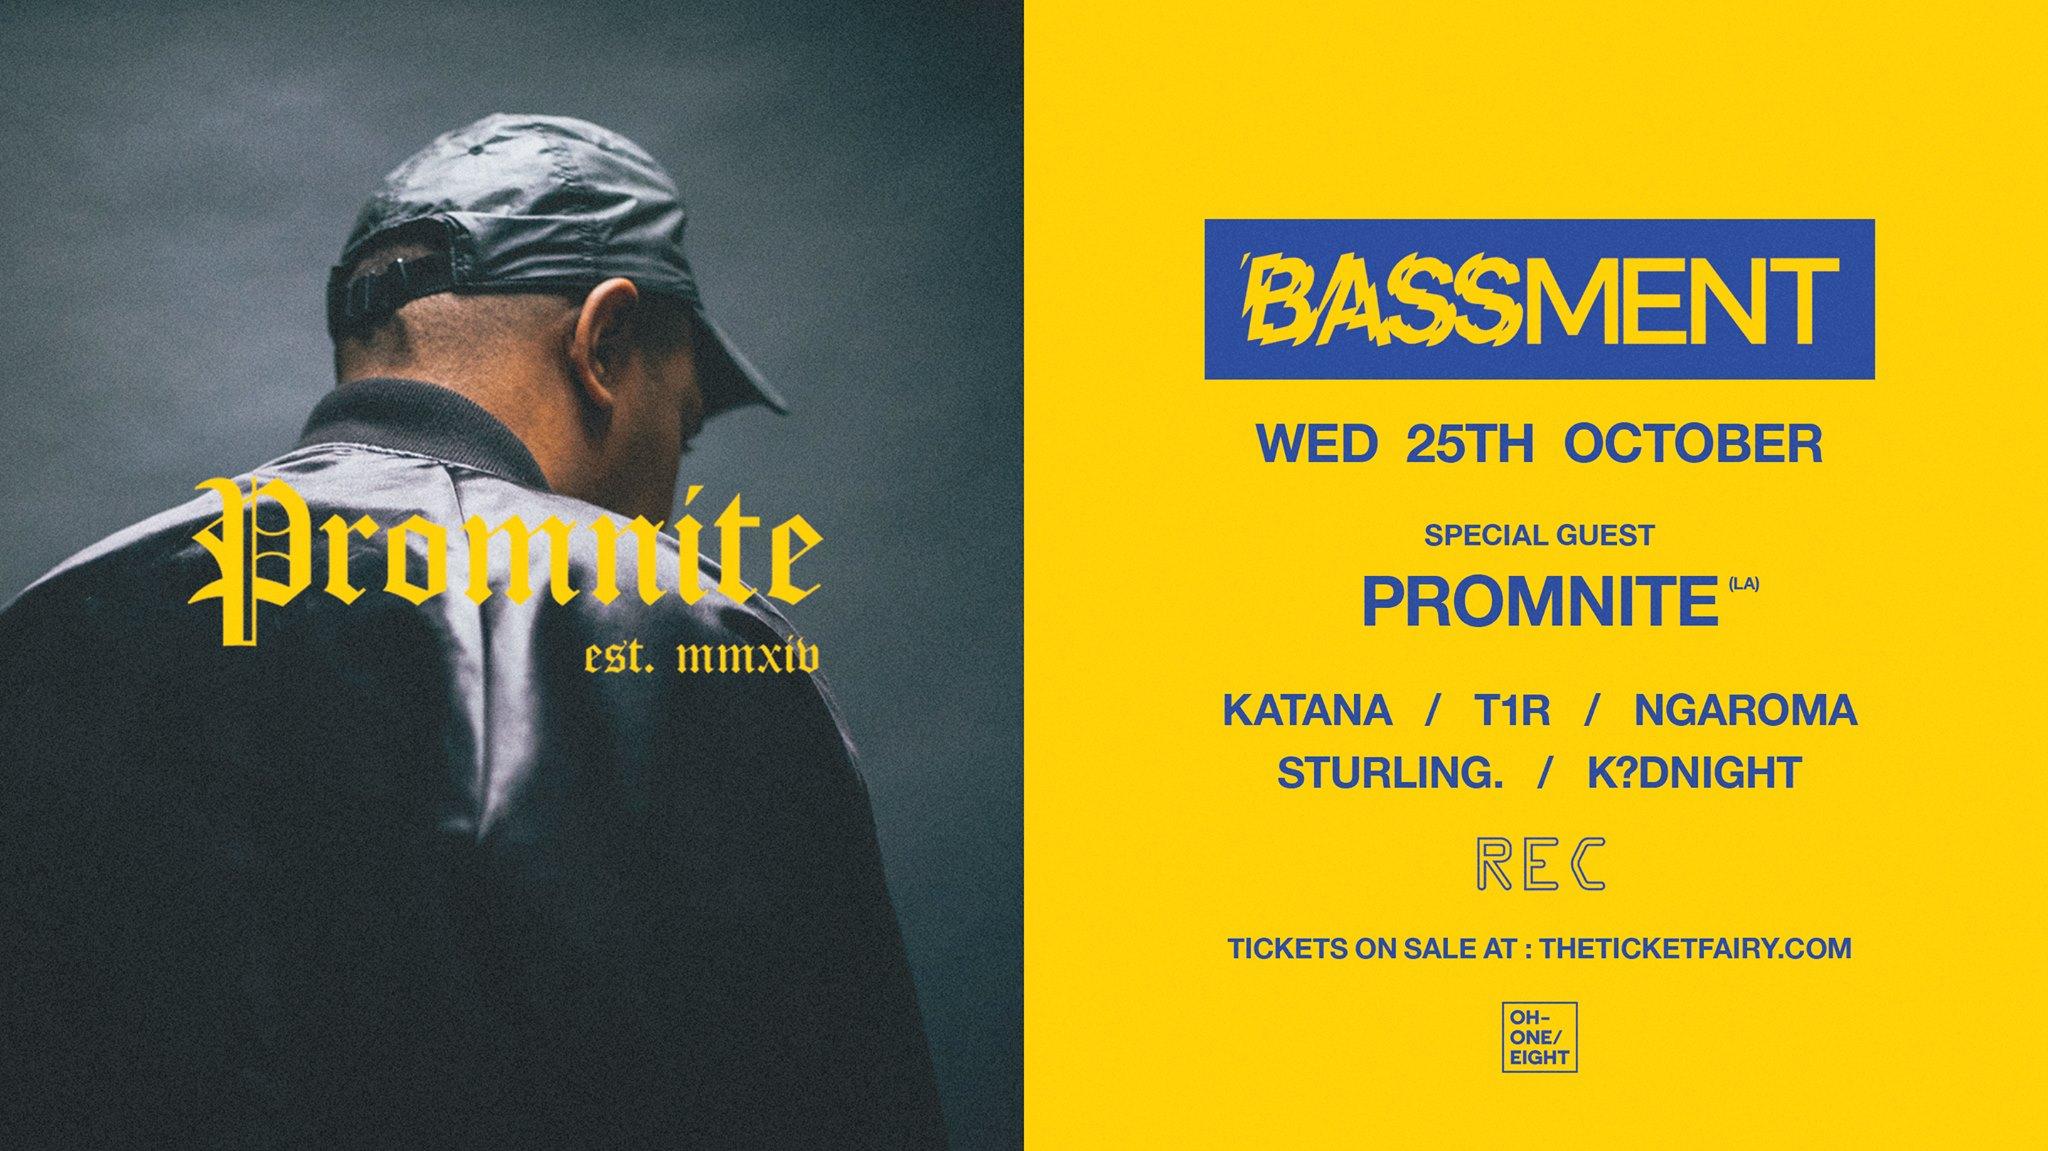 Bassment x 018 - Promnite